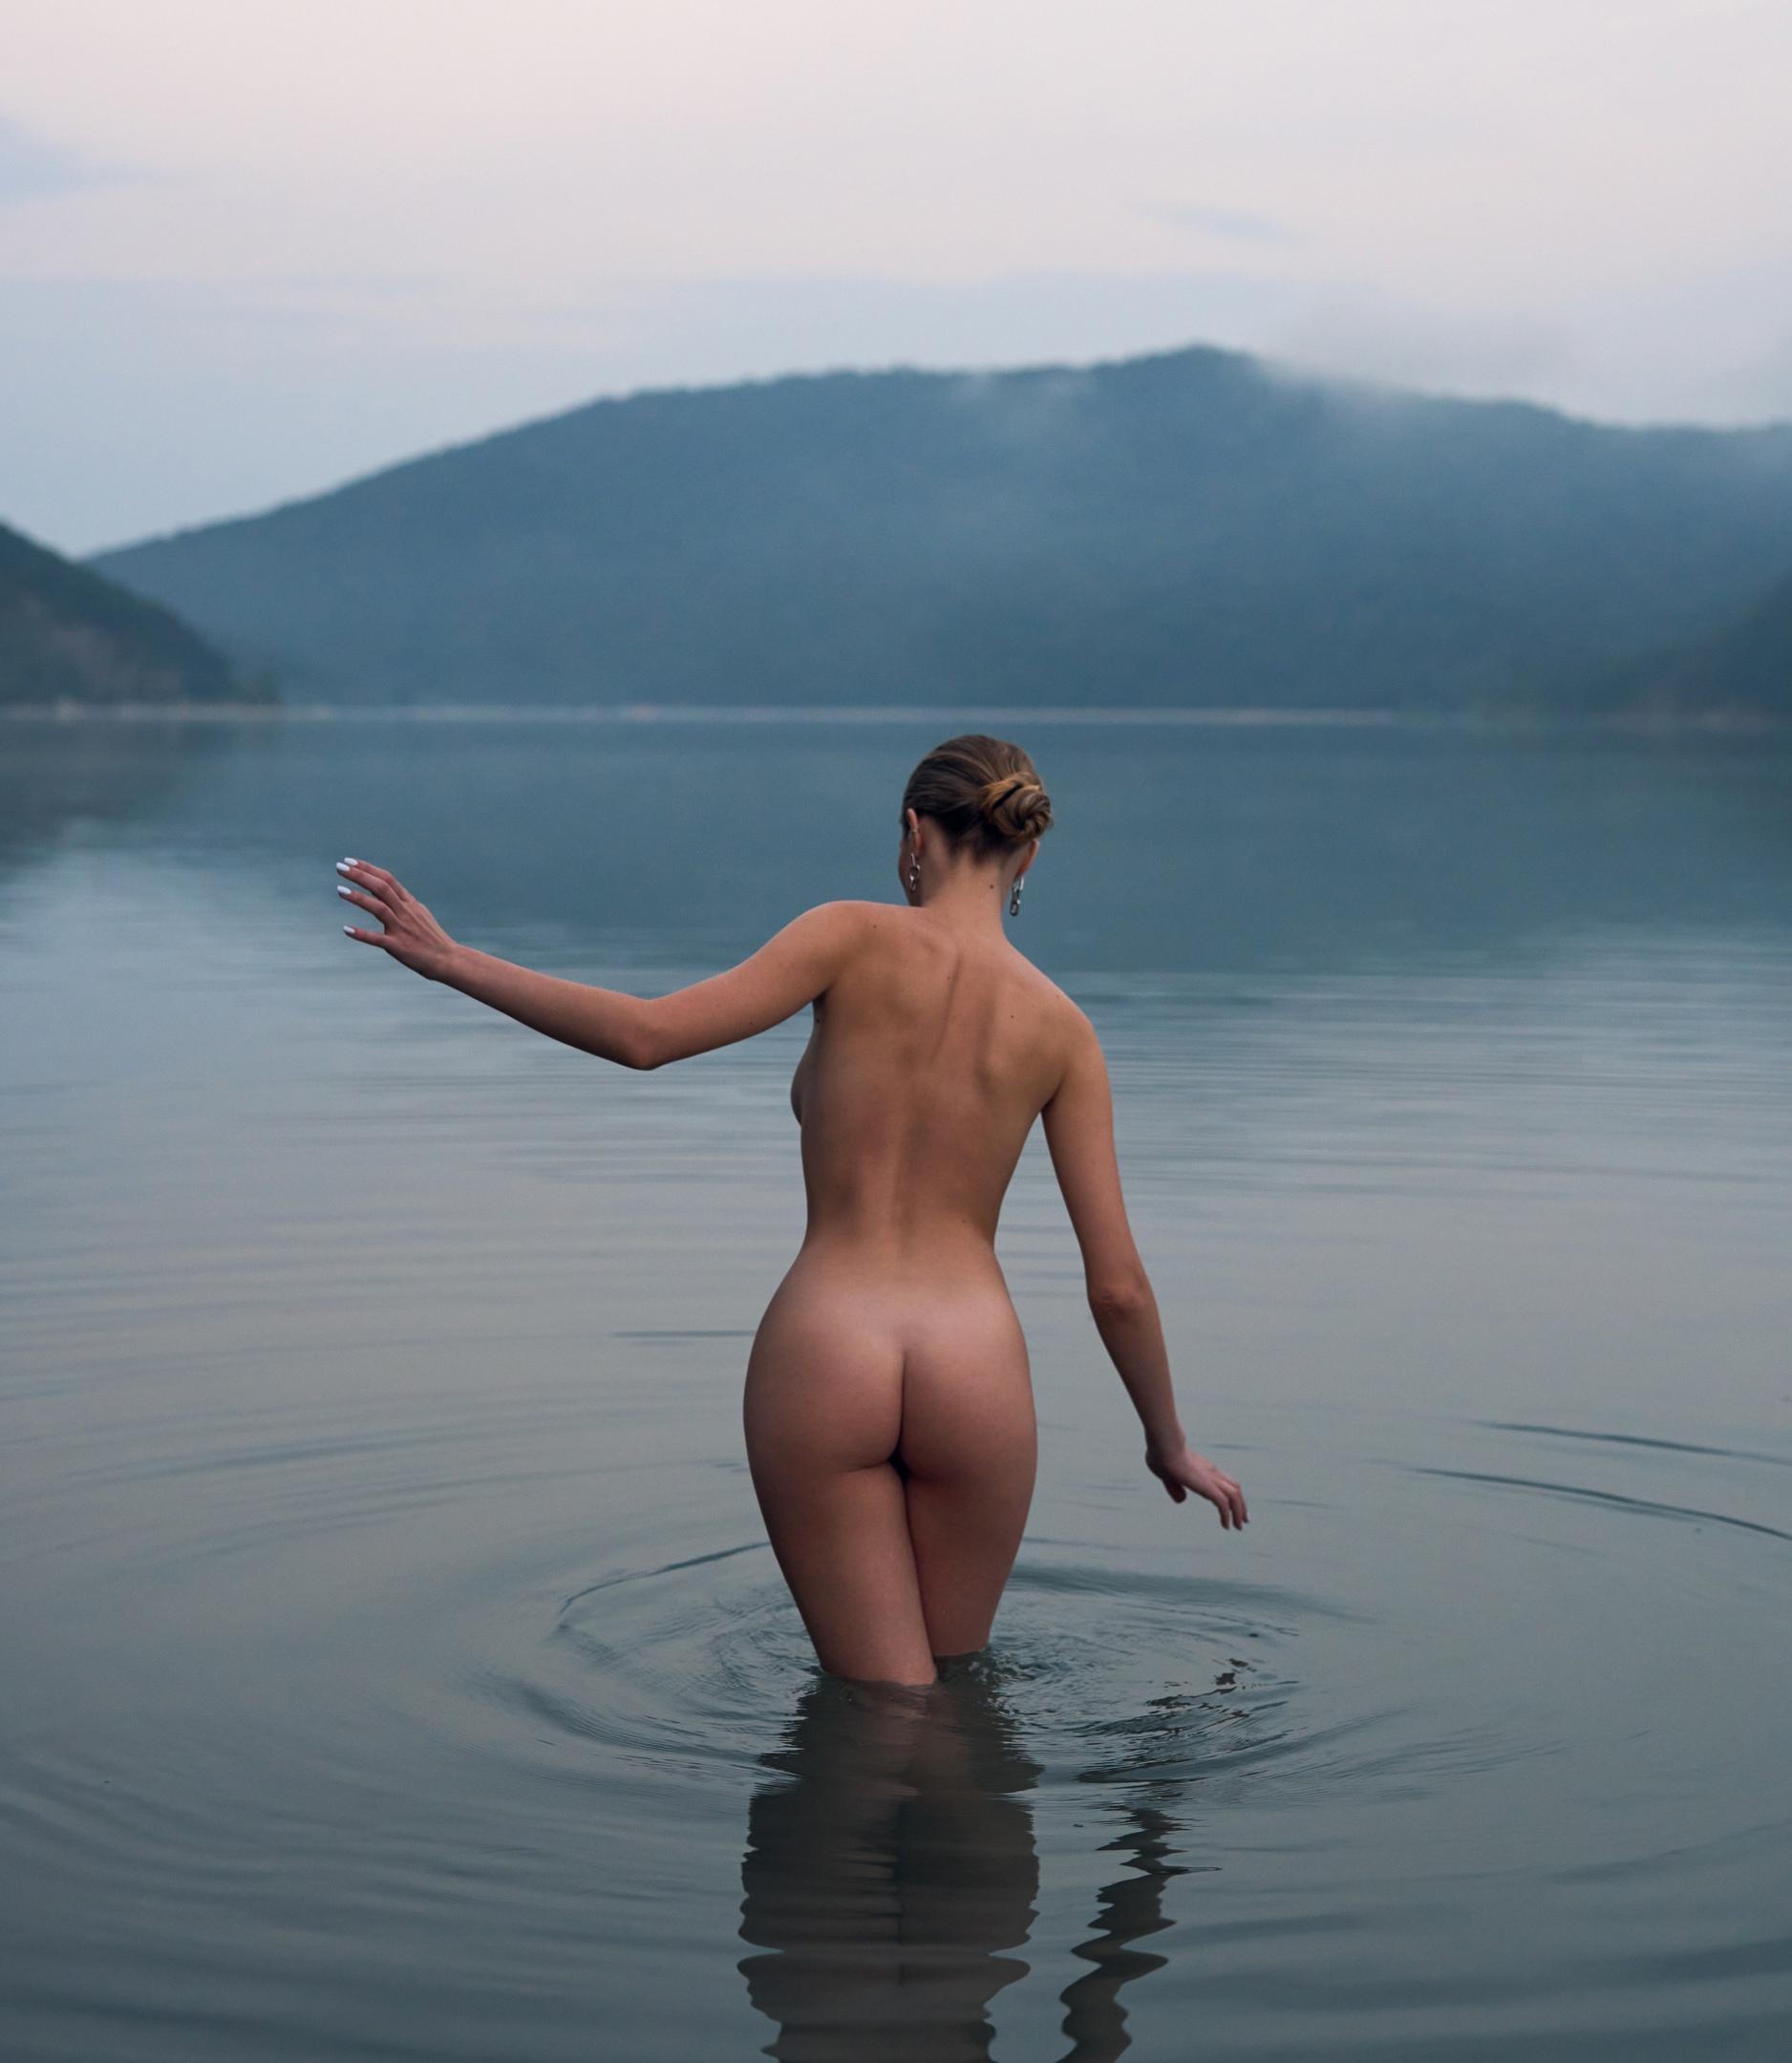 https://www.youngfolks.ru/pub/model-vasilisa-tyutneva-photographer-roman-filippov-113008